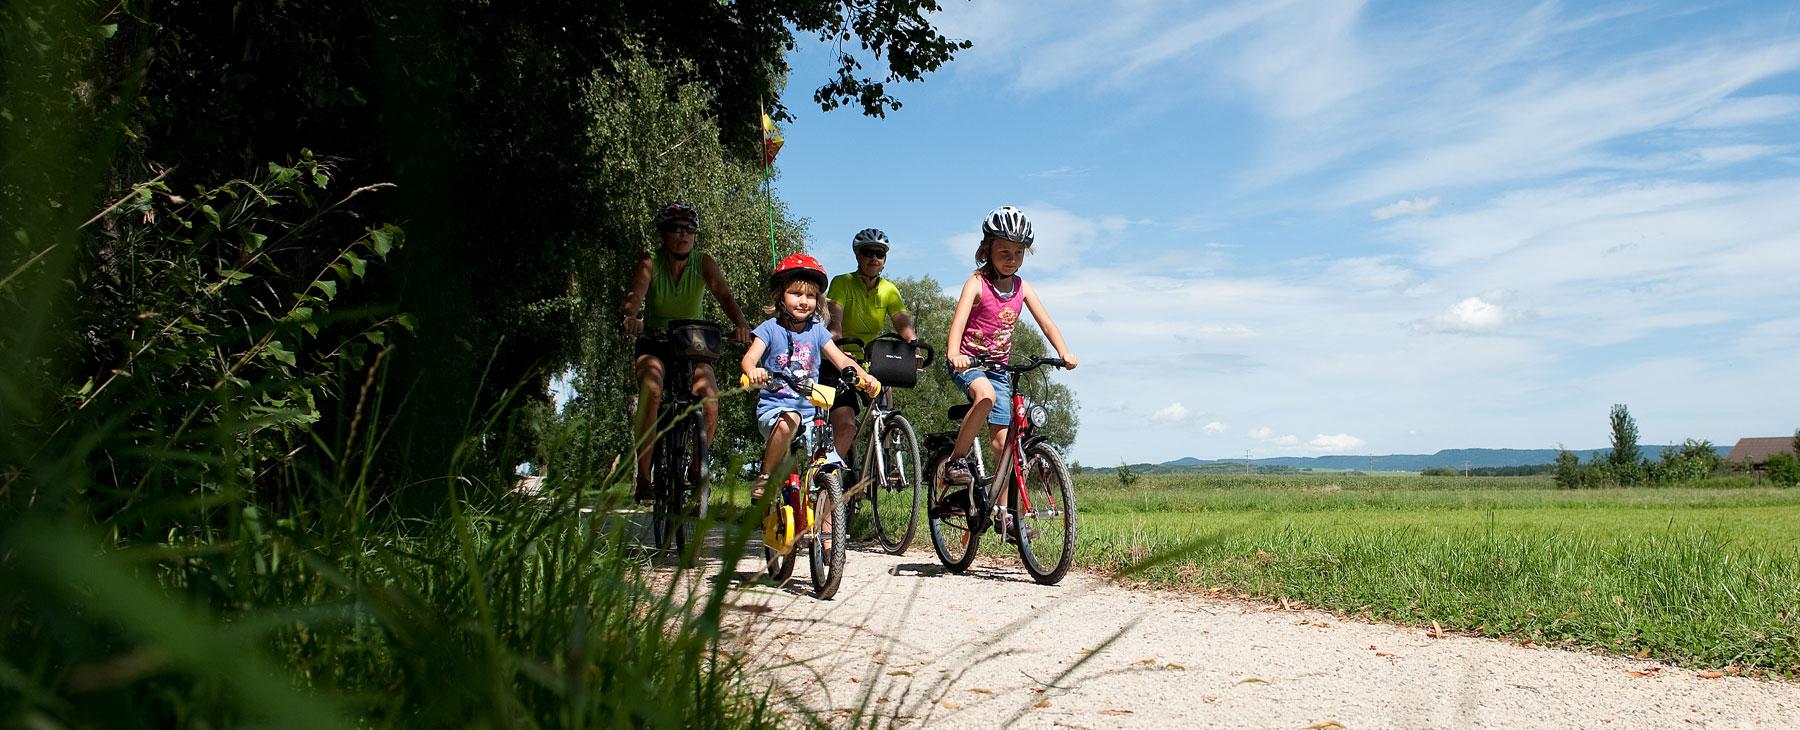 Familie am Fahrradfahren